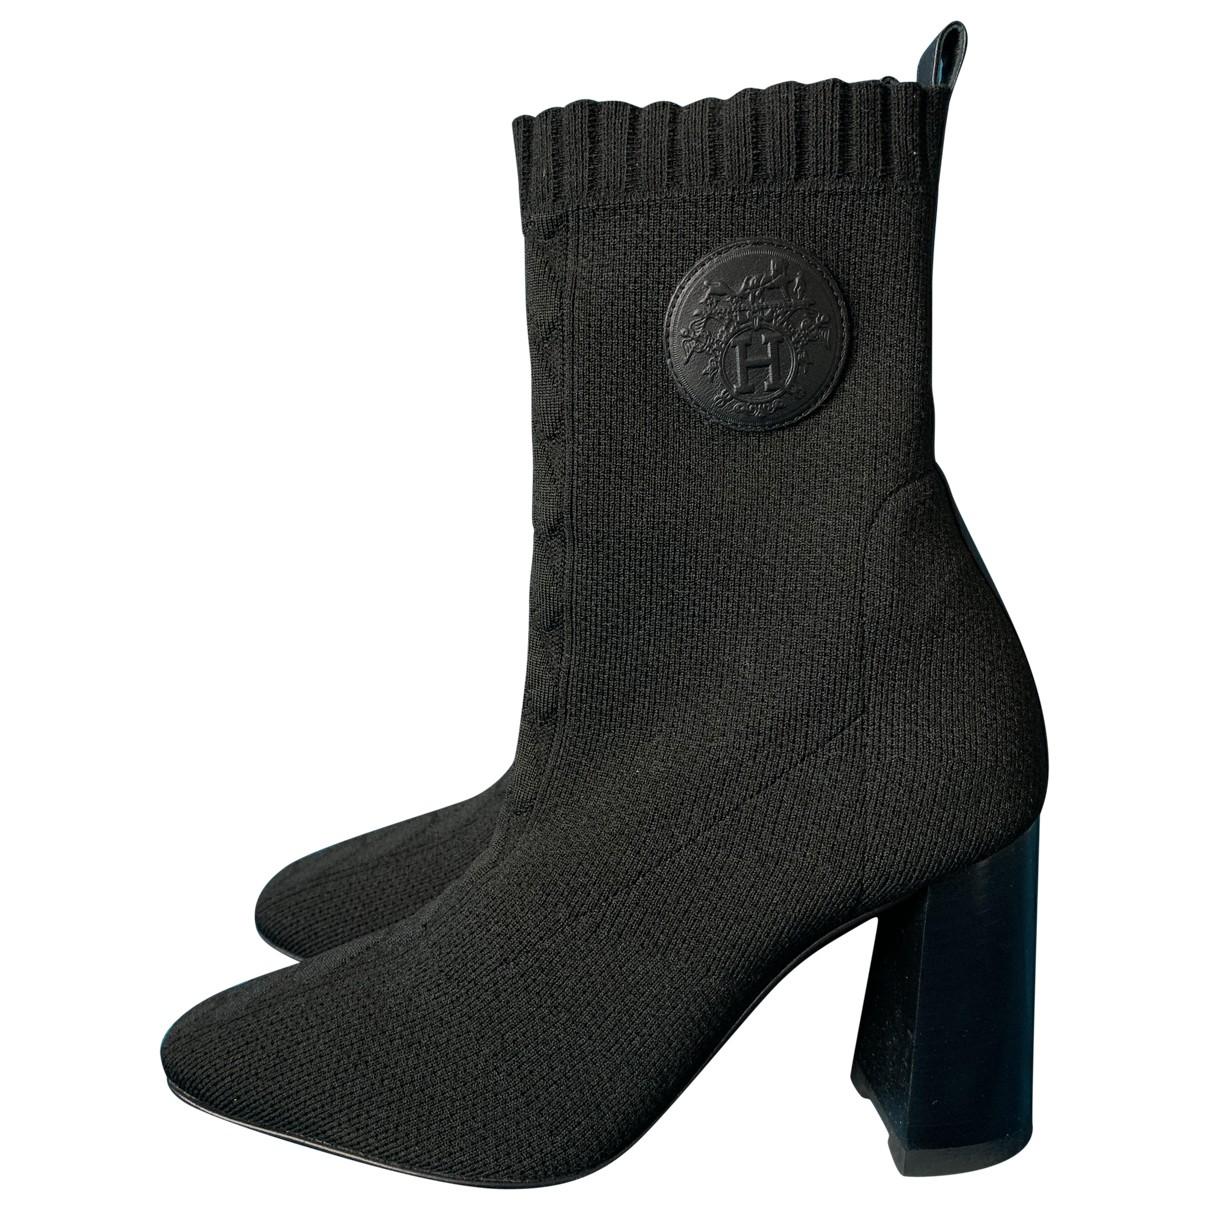 Hermès N Black Cloth Ankle boots for Women 36 EU